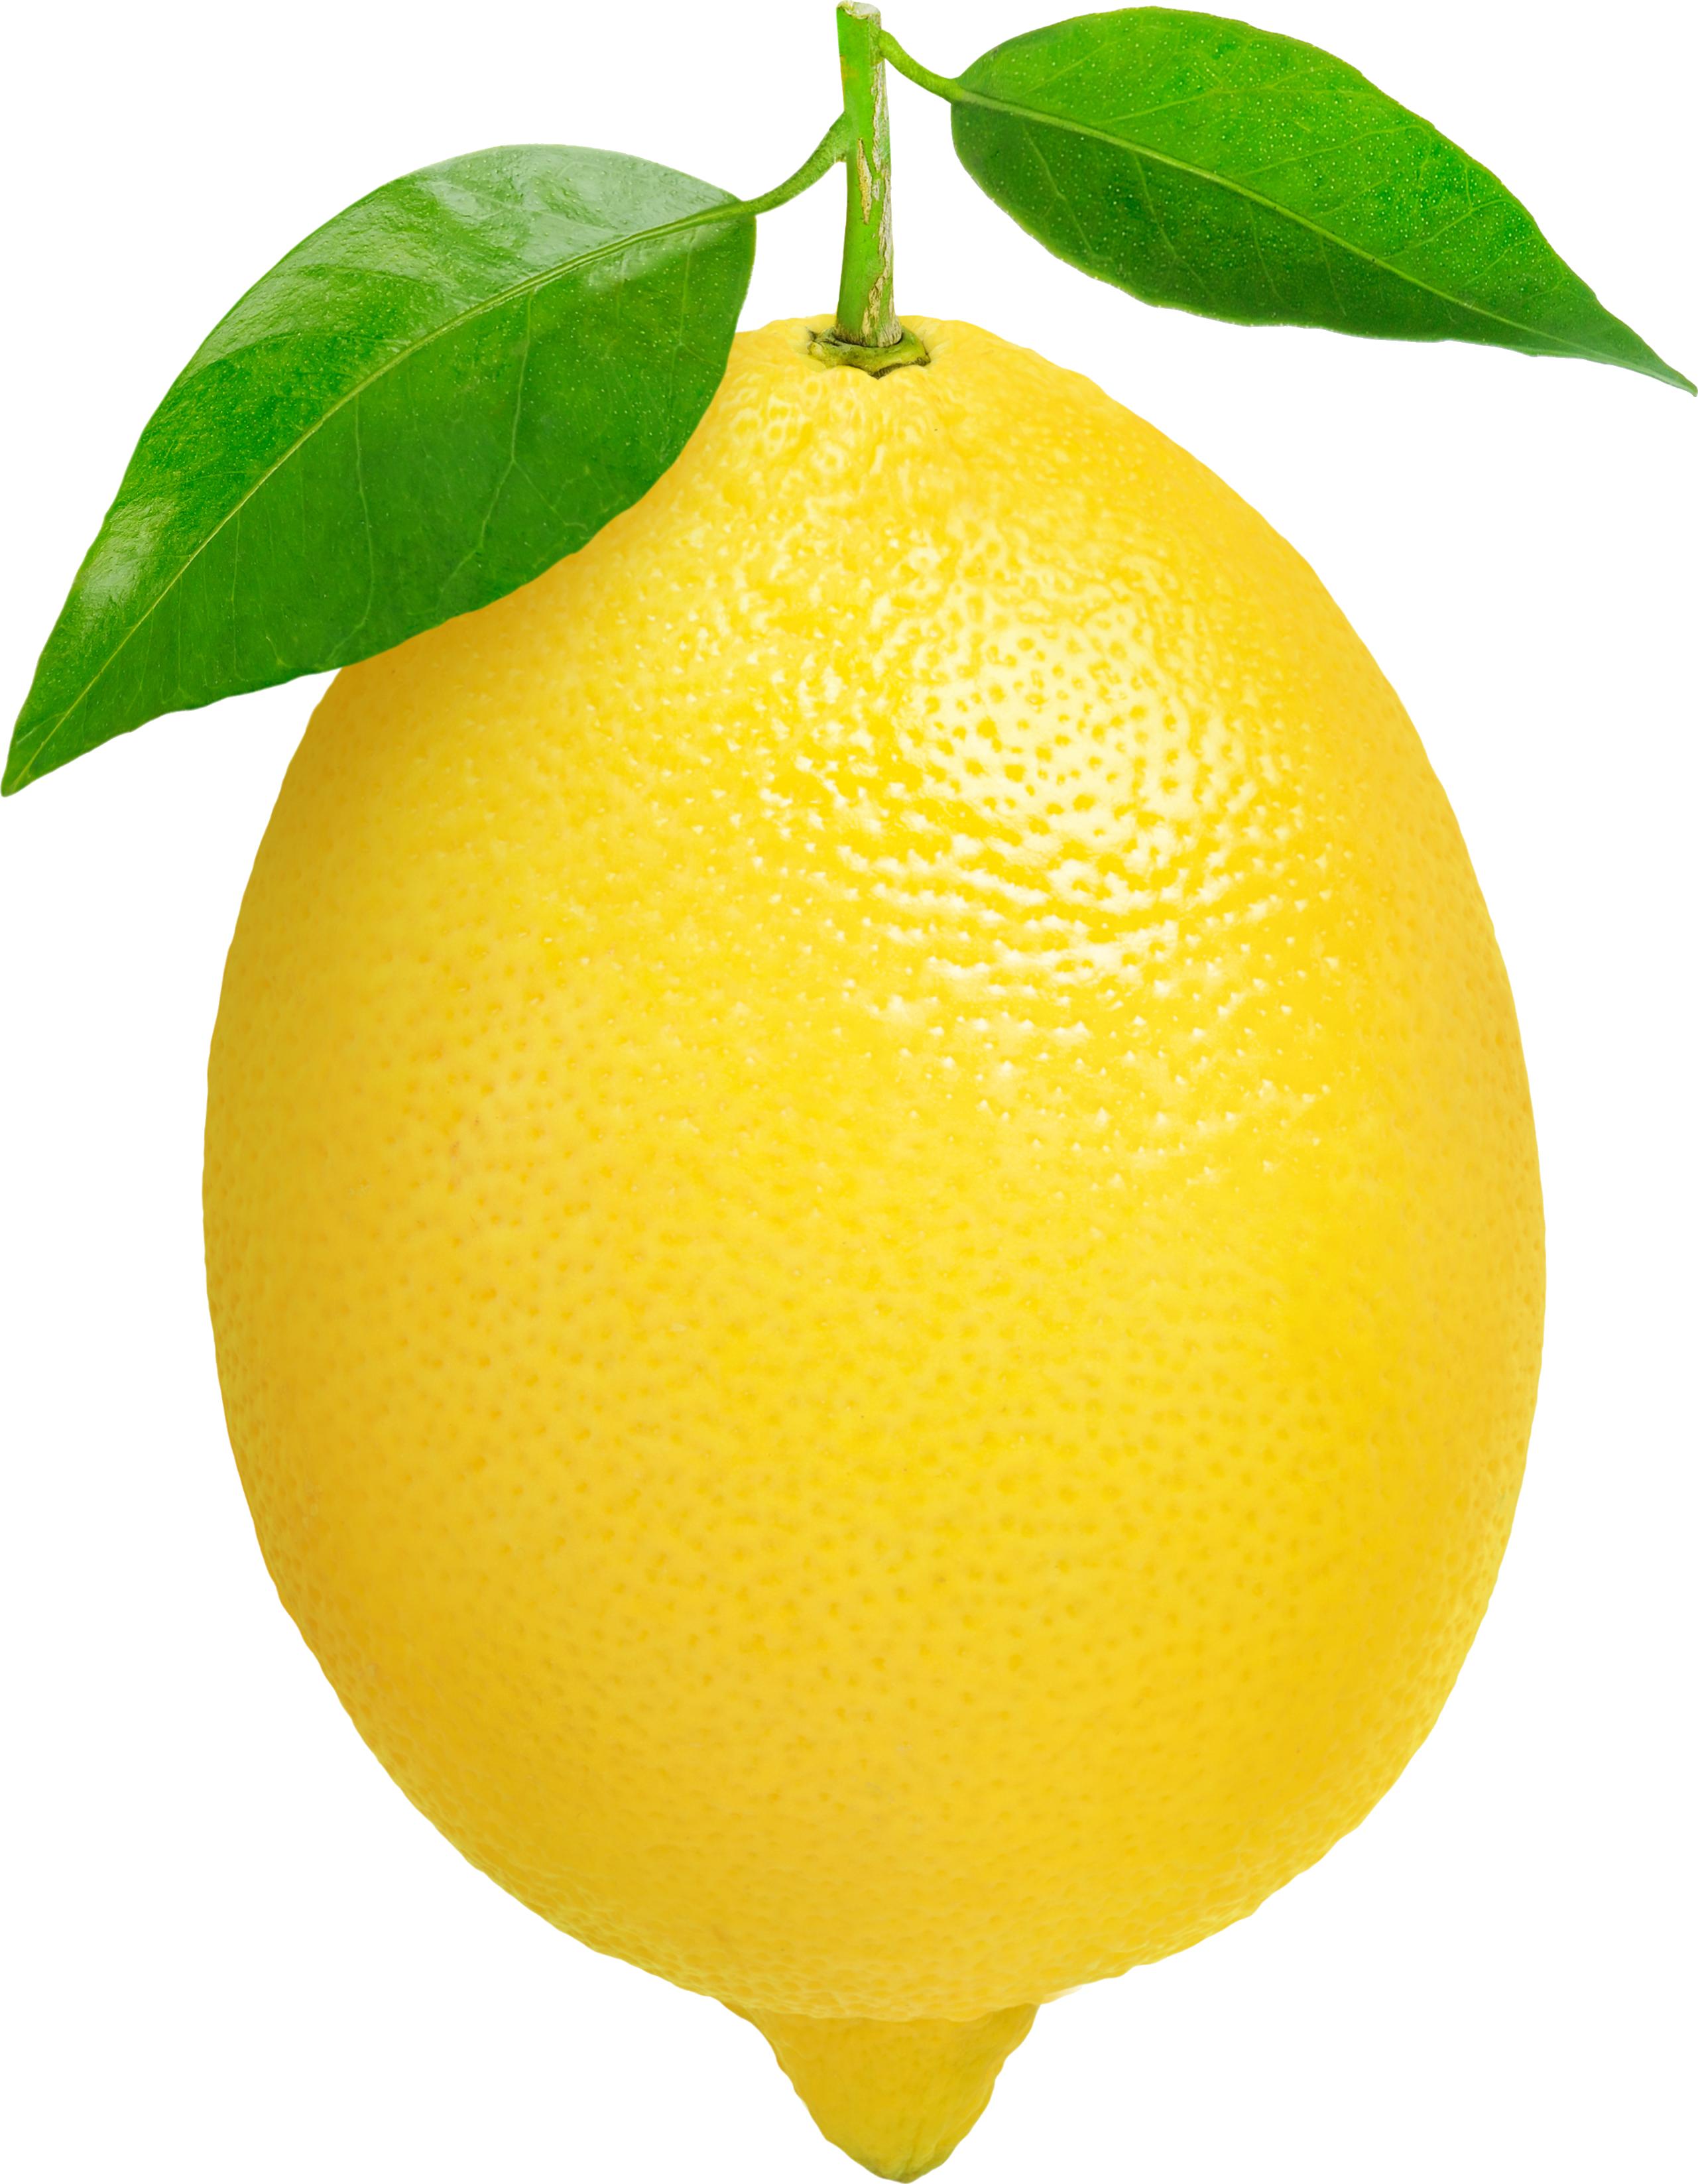 Lemon #10